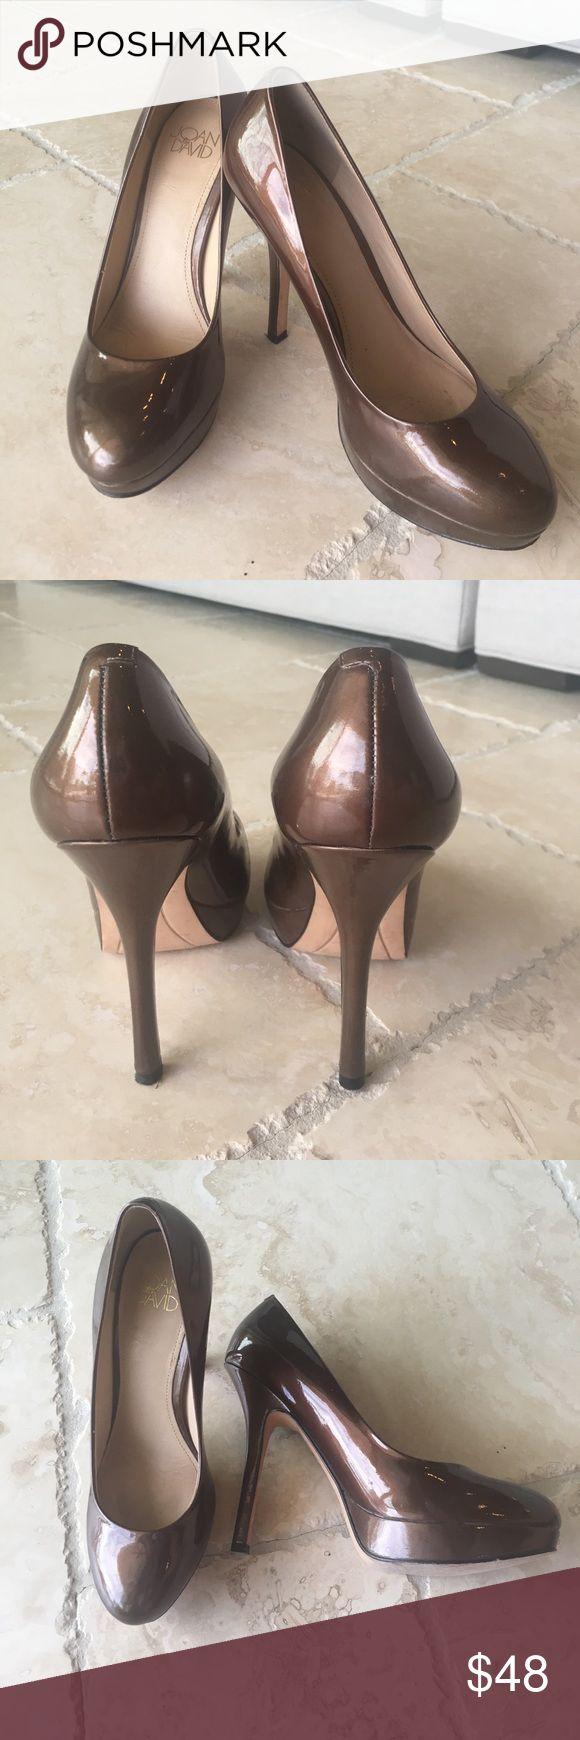 GUC Joan & David Flipp Platform Pump GUC Joan & David Flipp Platform Pump, worn twice, leather sole is the only part that shows wear Joan & David Shoes Heels